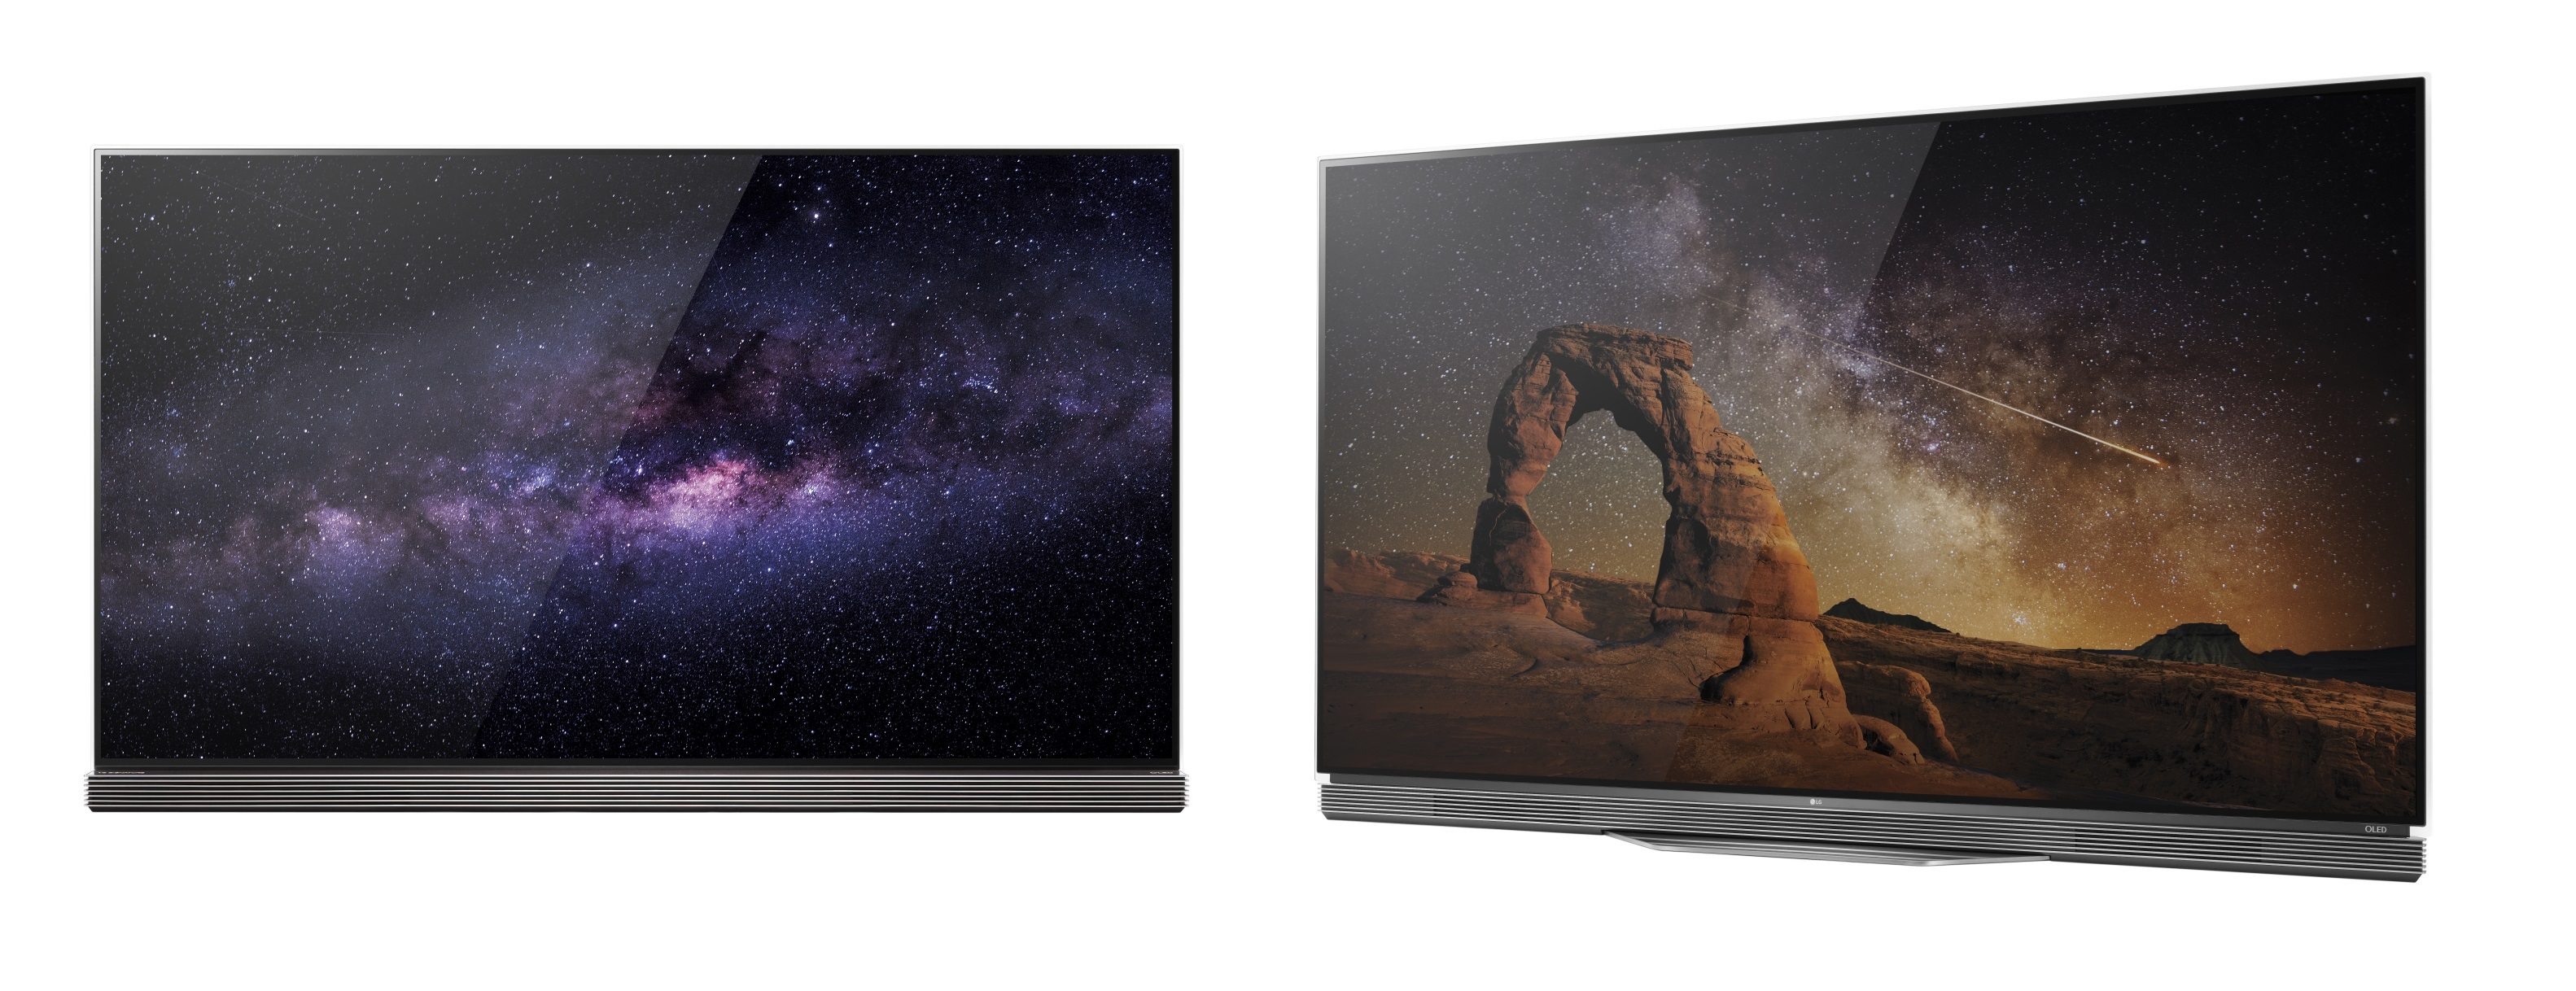 【CES 2016】LG 推出多款搭載 HDR 的高階電視